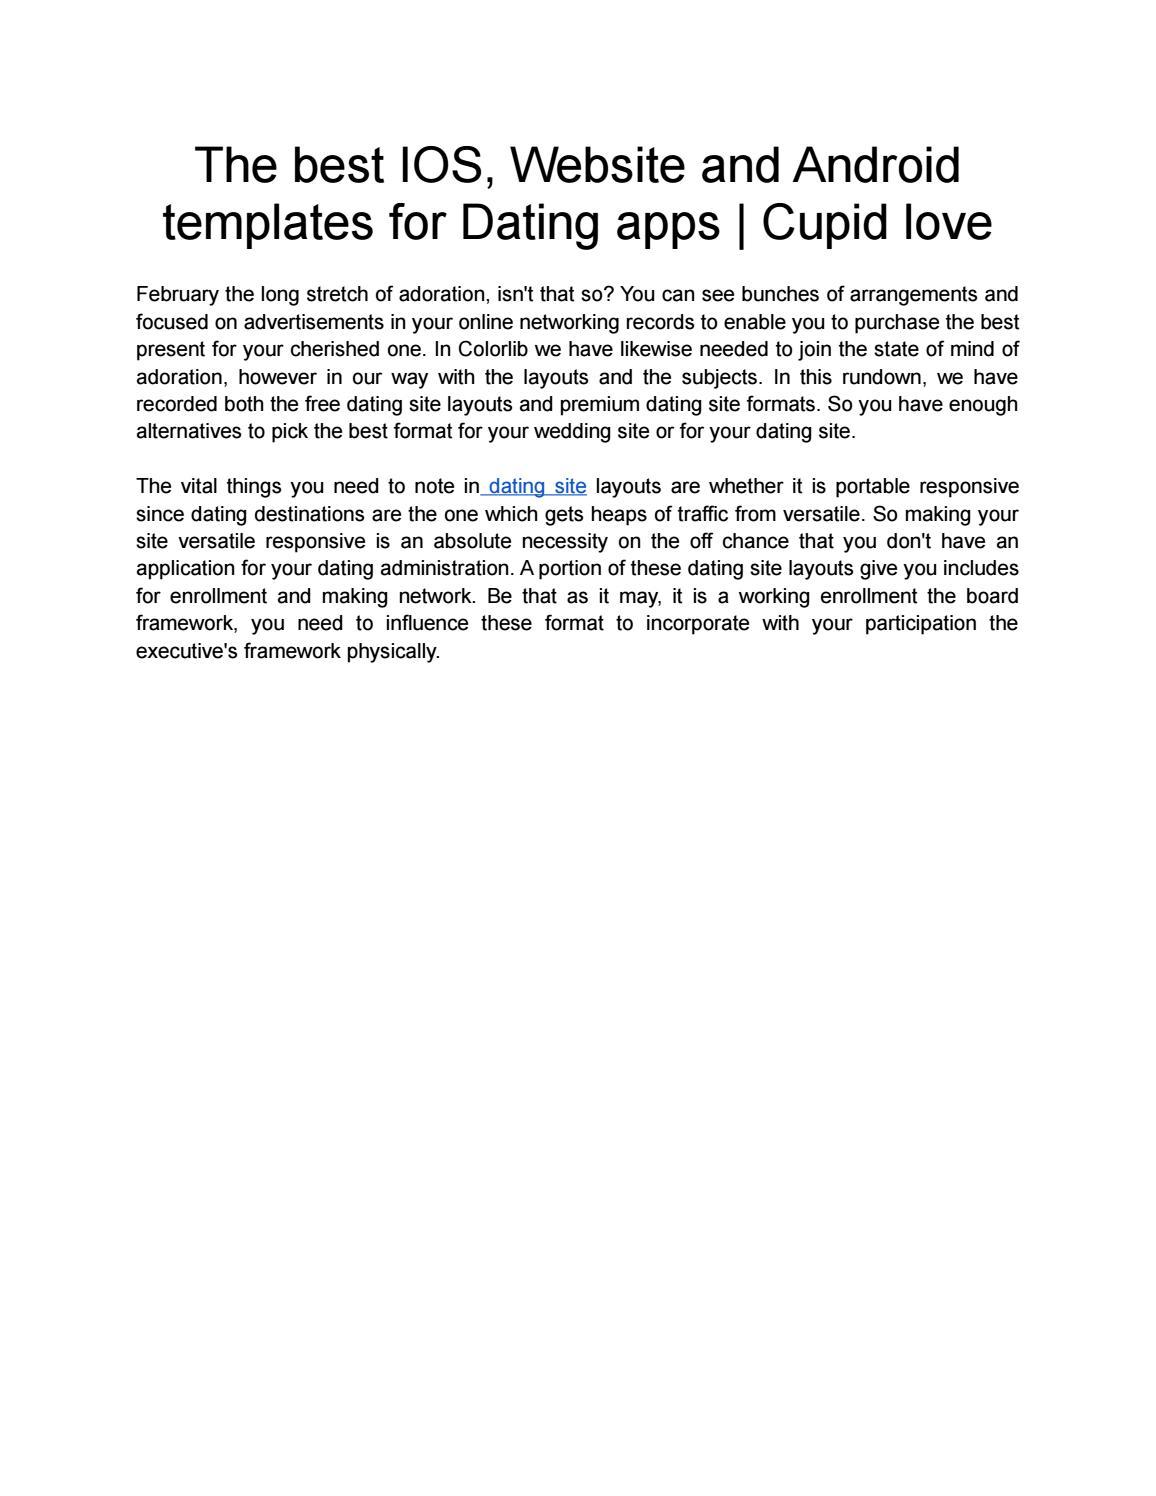 Cupid dating iOS